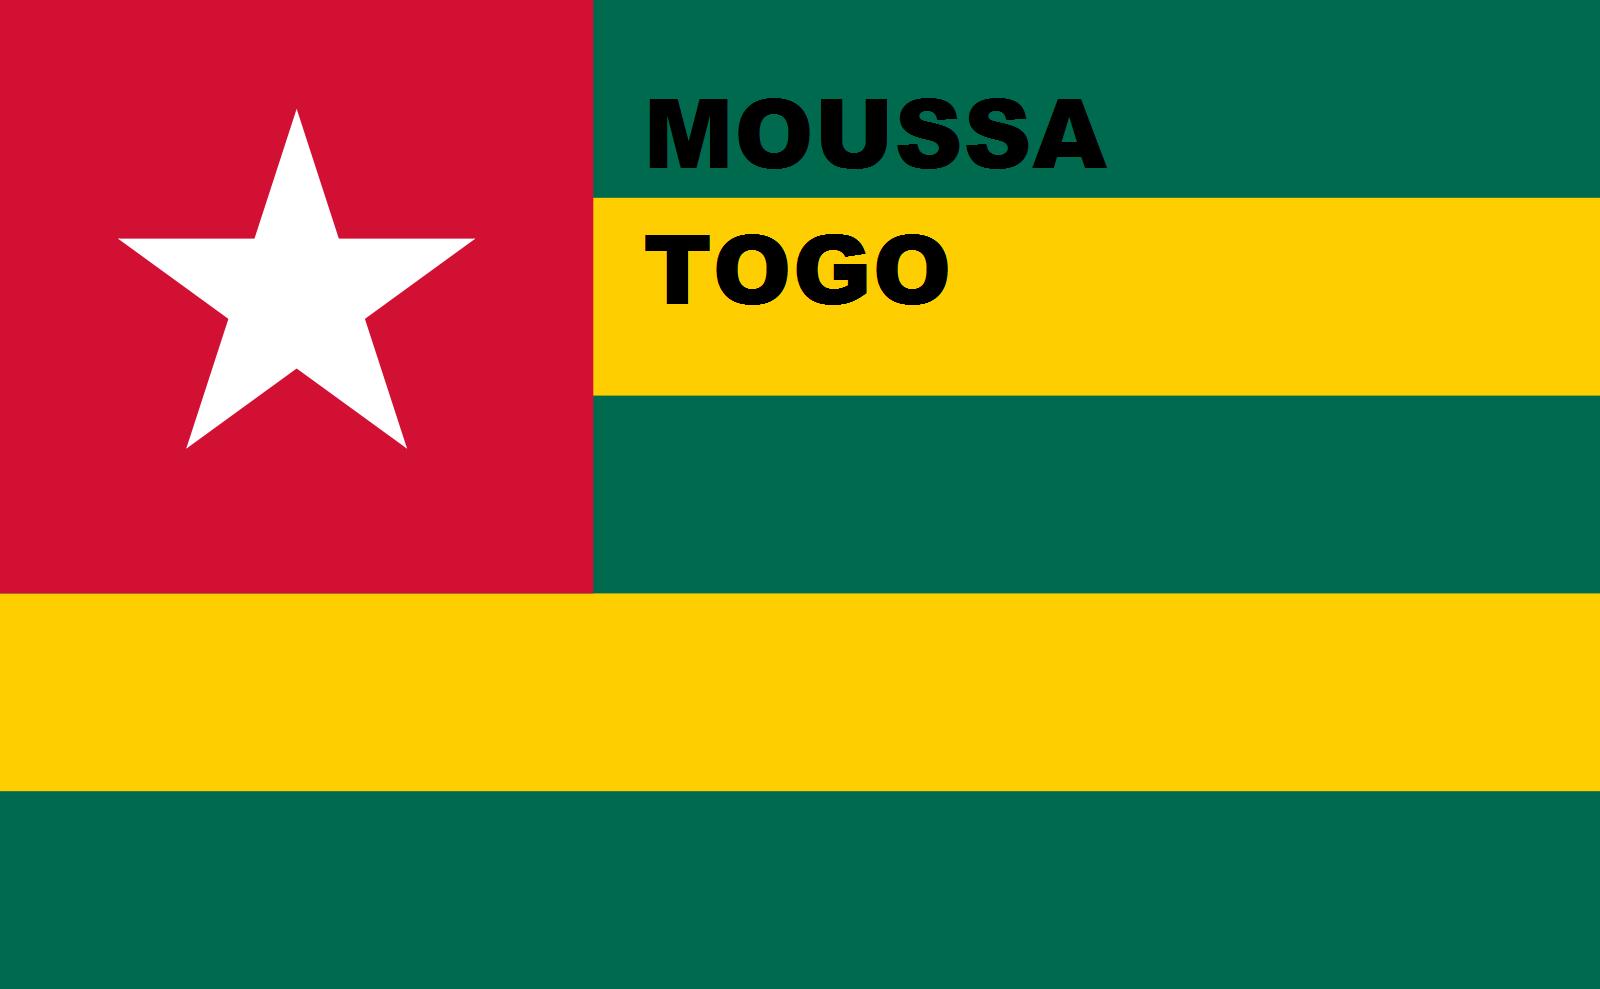 Moussapolitiquetogo Logo